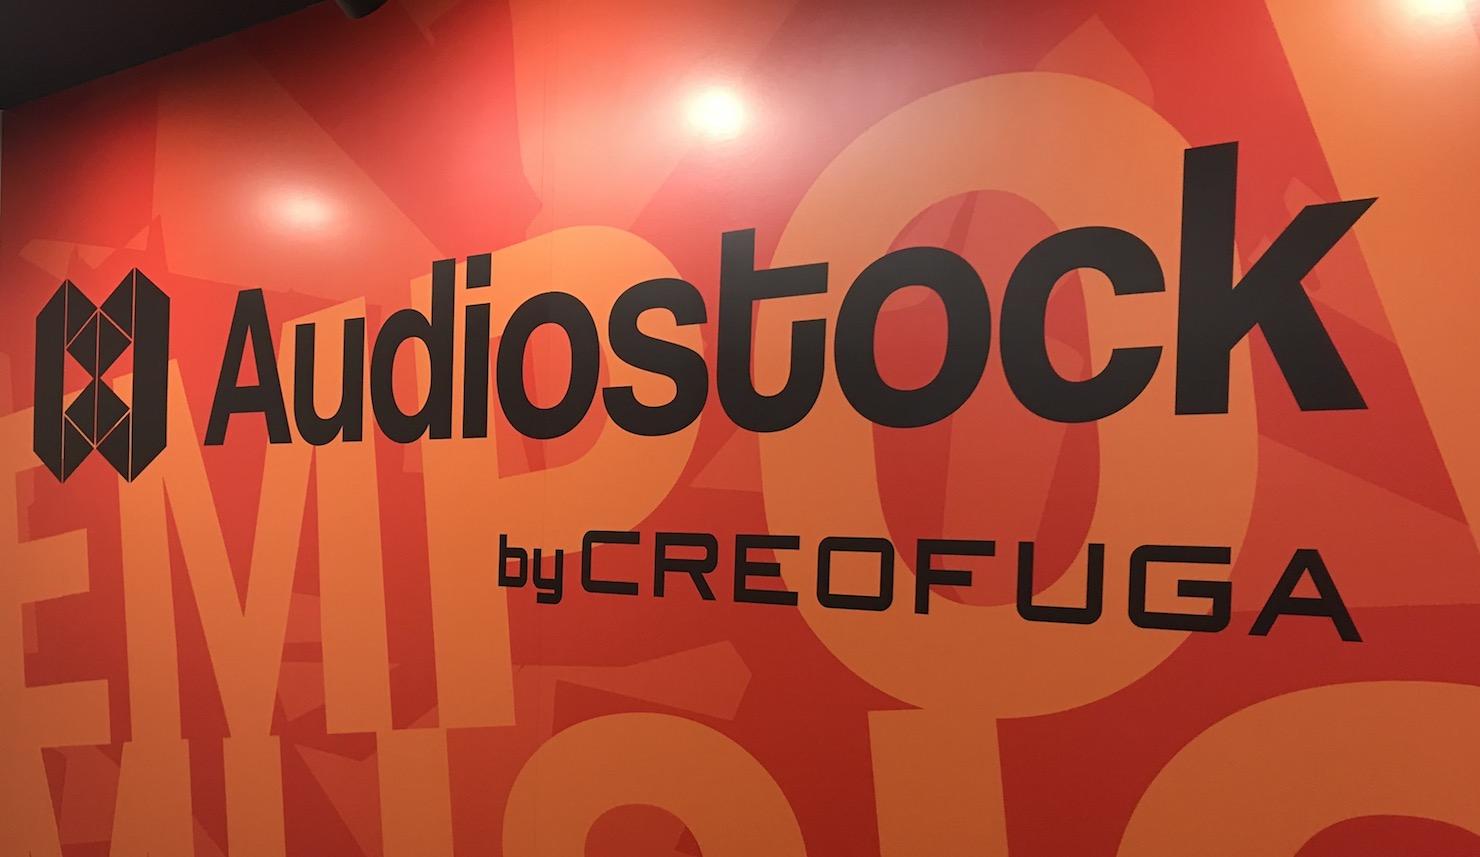 audiostockstudio